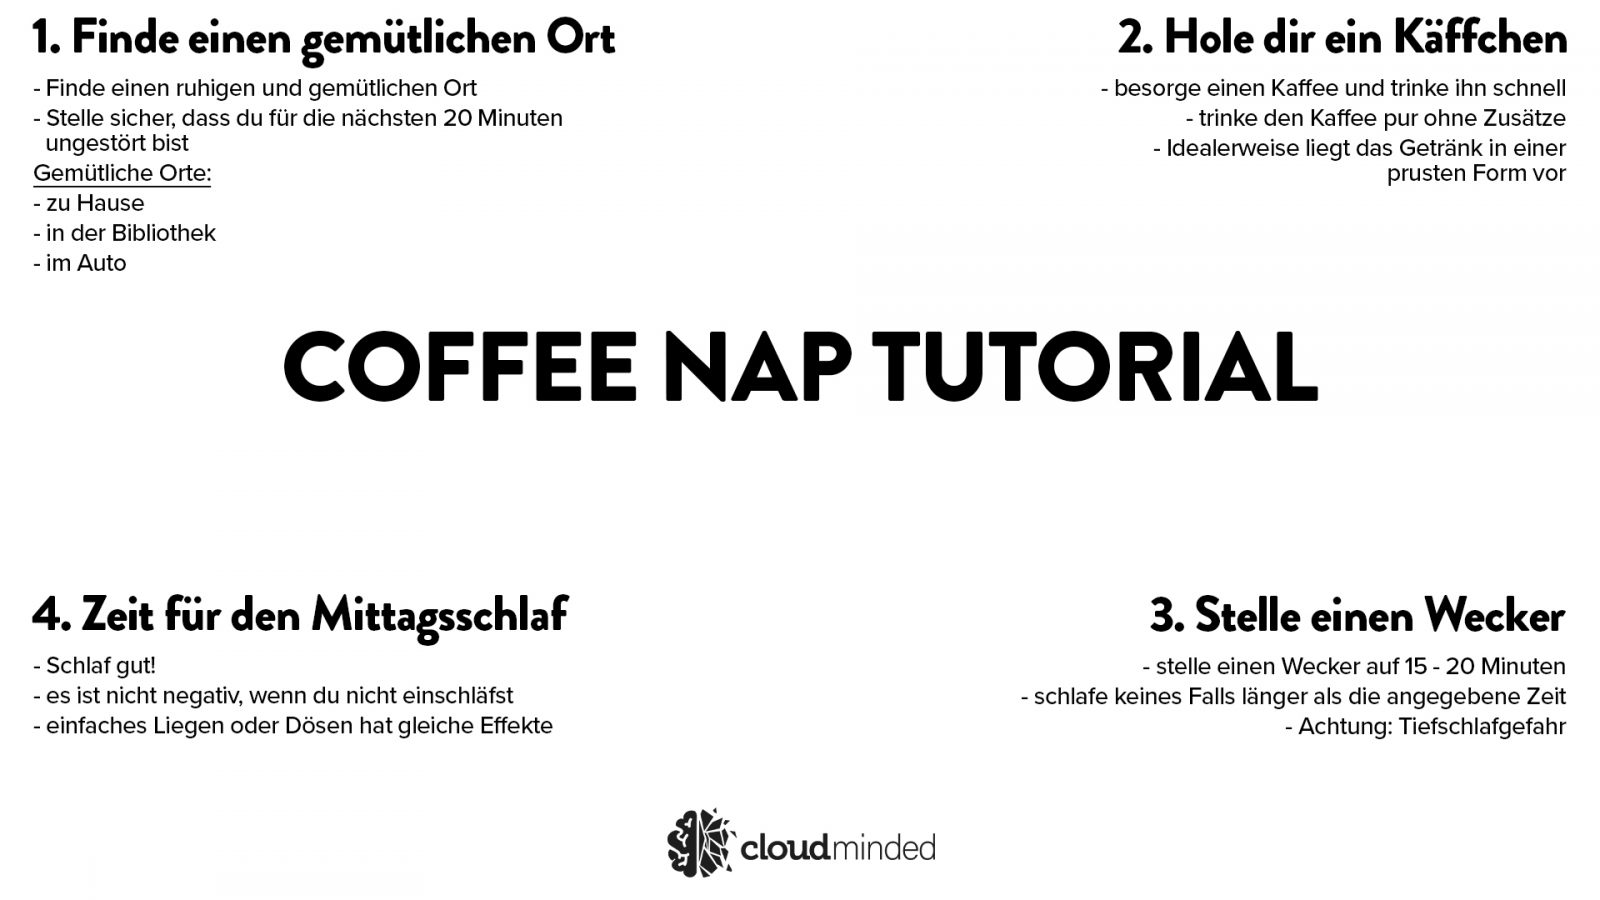 Coffee Nap Tutorial